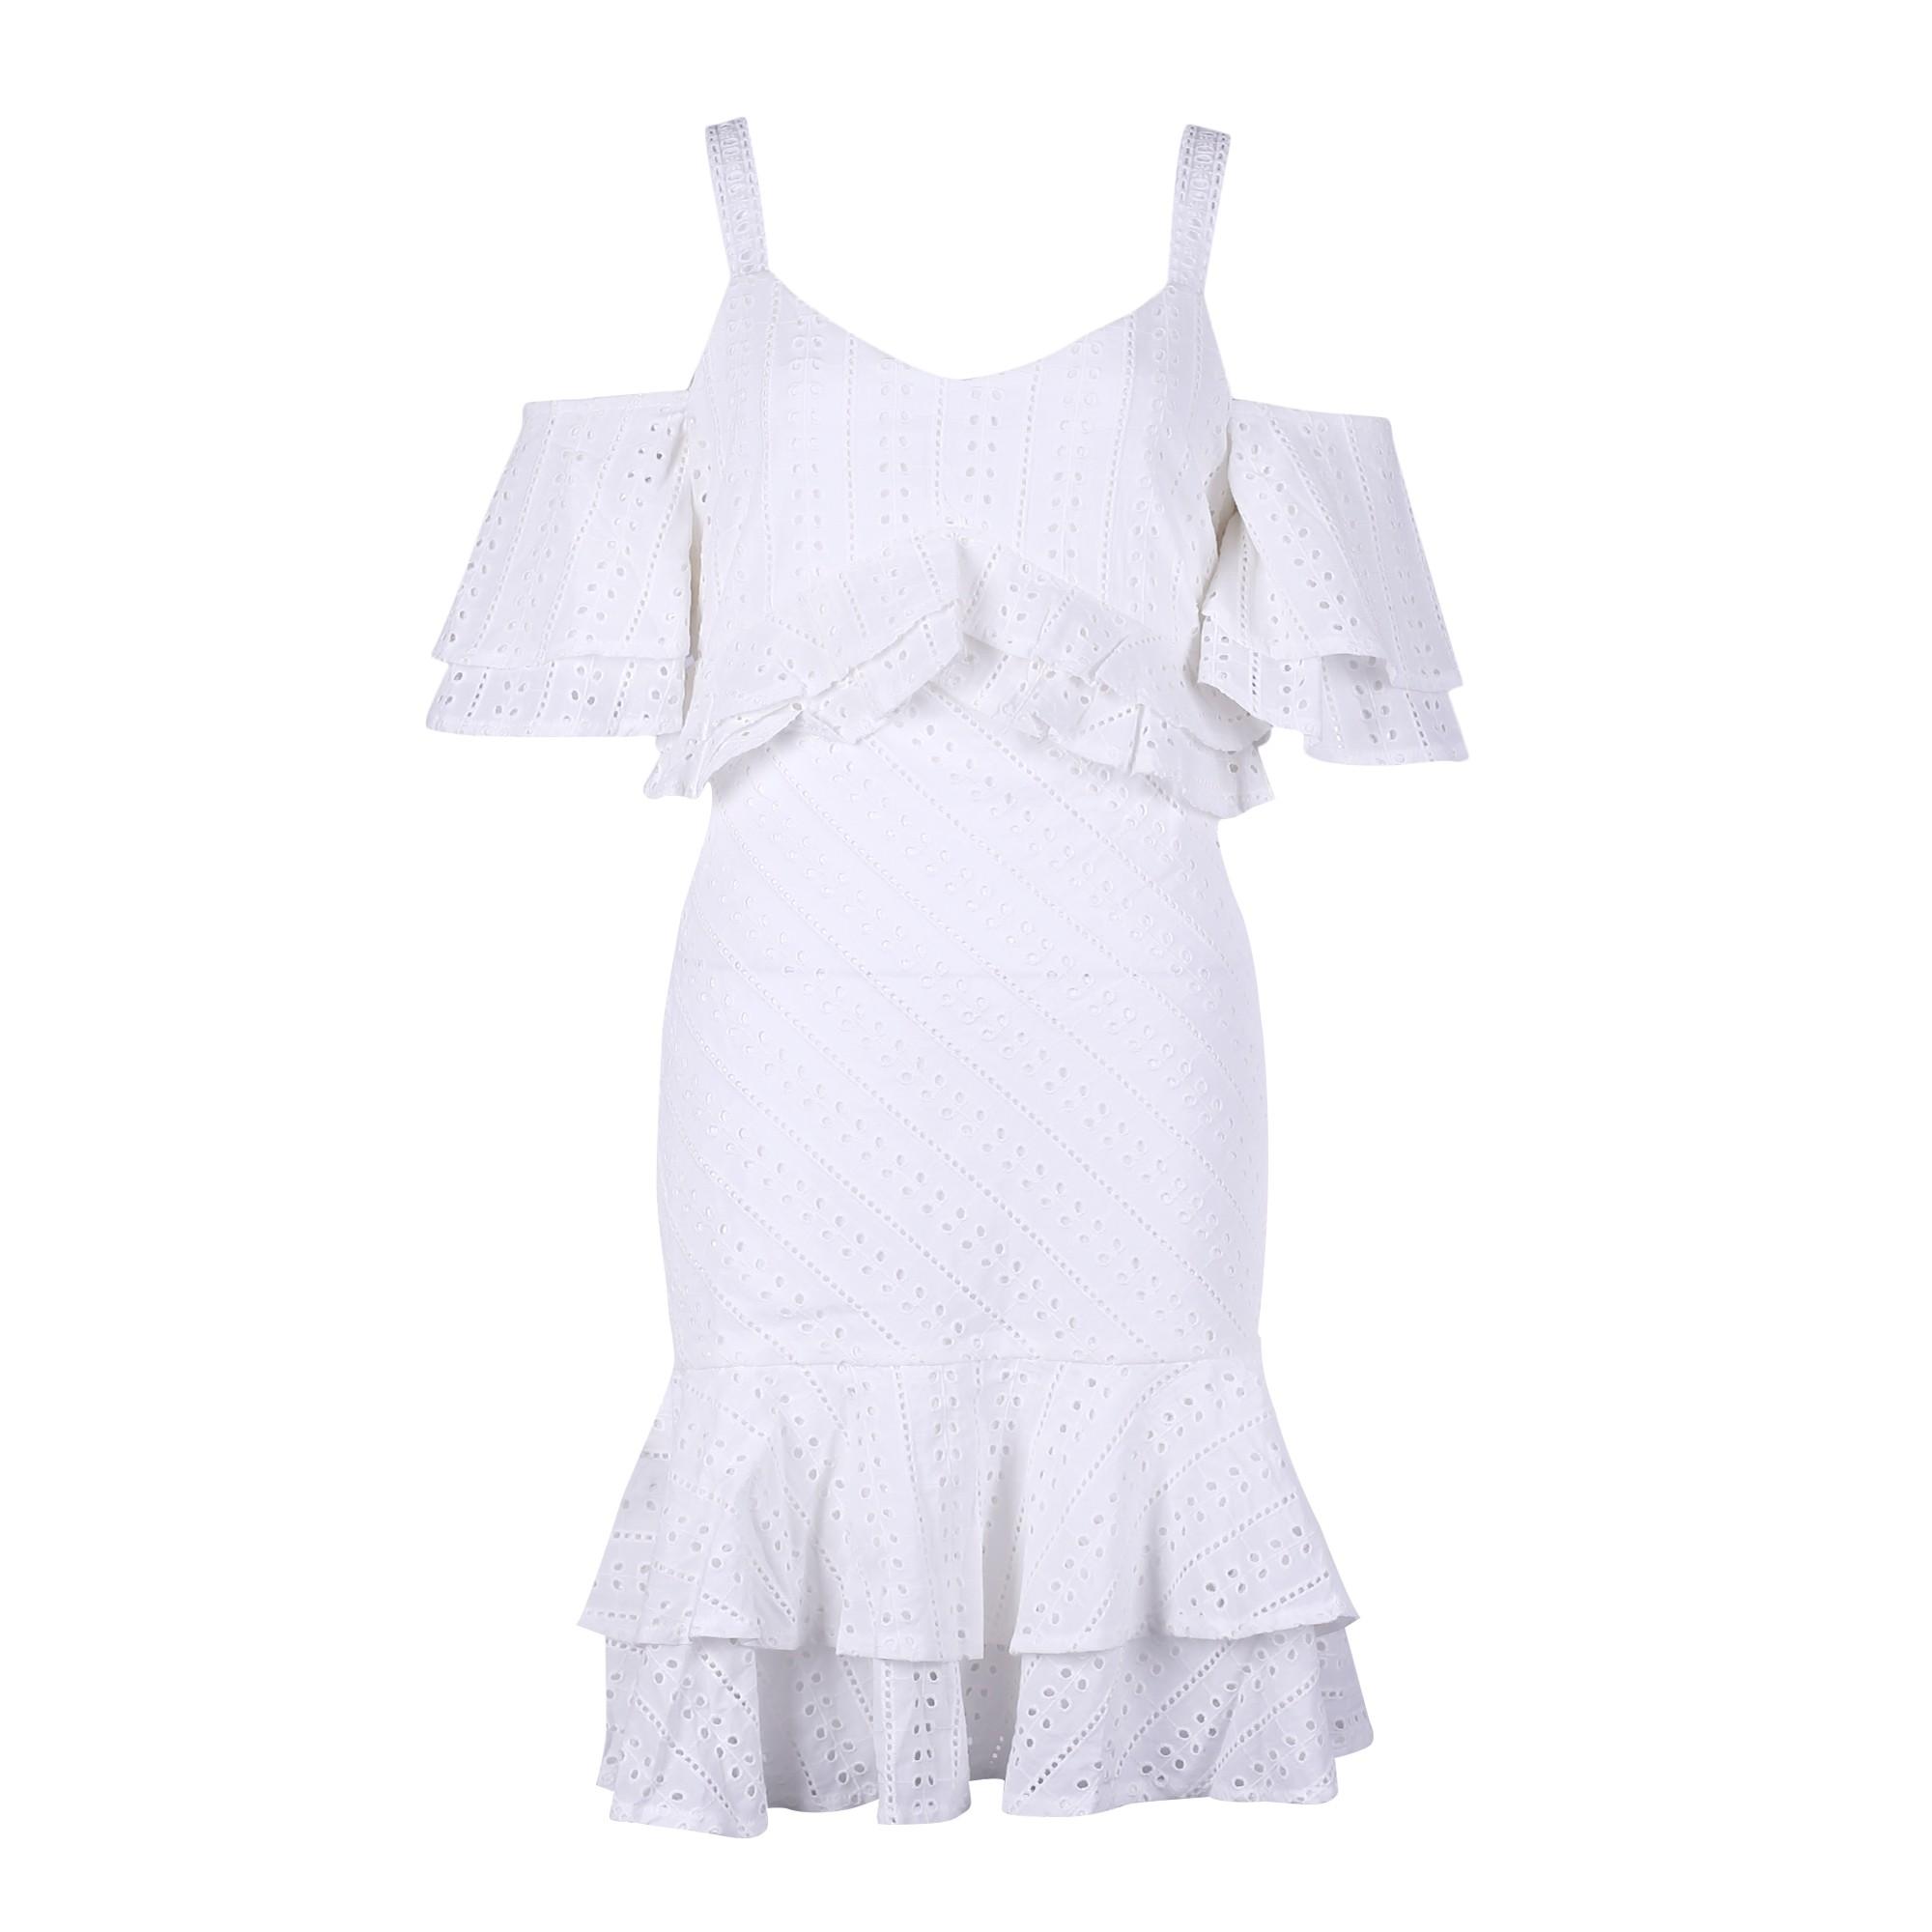 Rayon - White V Neck Shortsleeve Mini Strapy Mesh Fashion Bodycon Dress HJ534-White